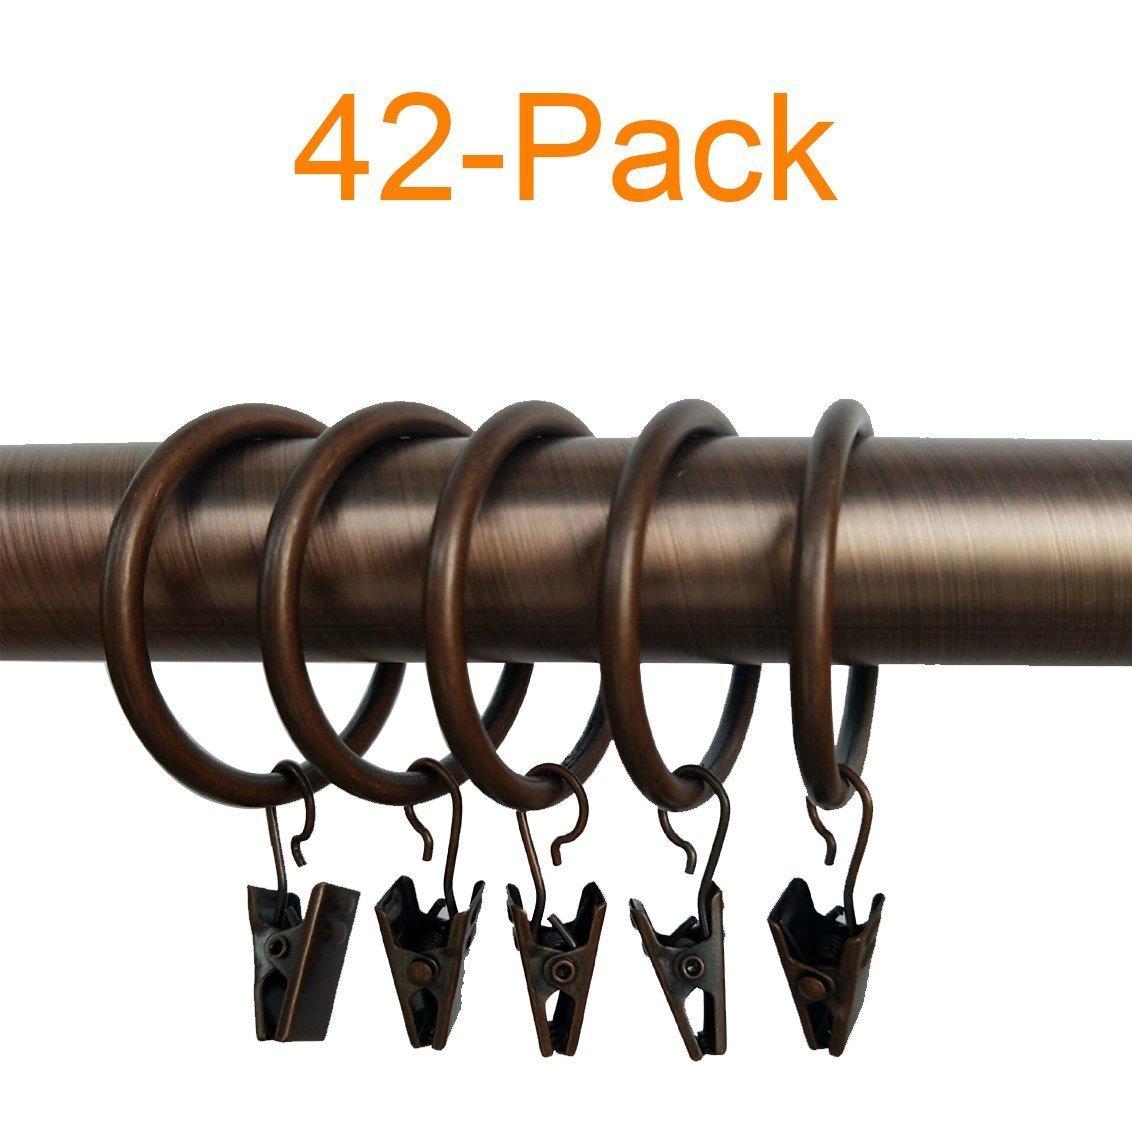 LiangTing 1.5'' Diameter Decorative Copper Matte Metal Curtain Clip Ring Set of 42